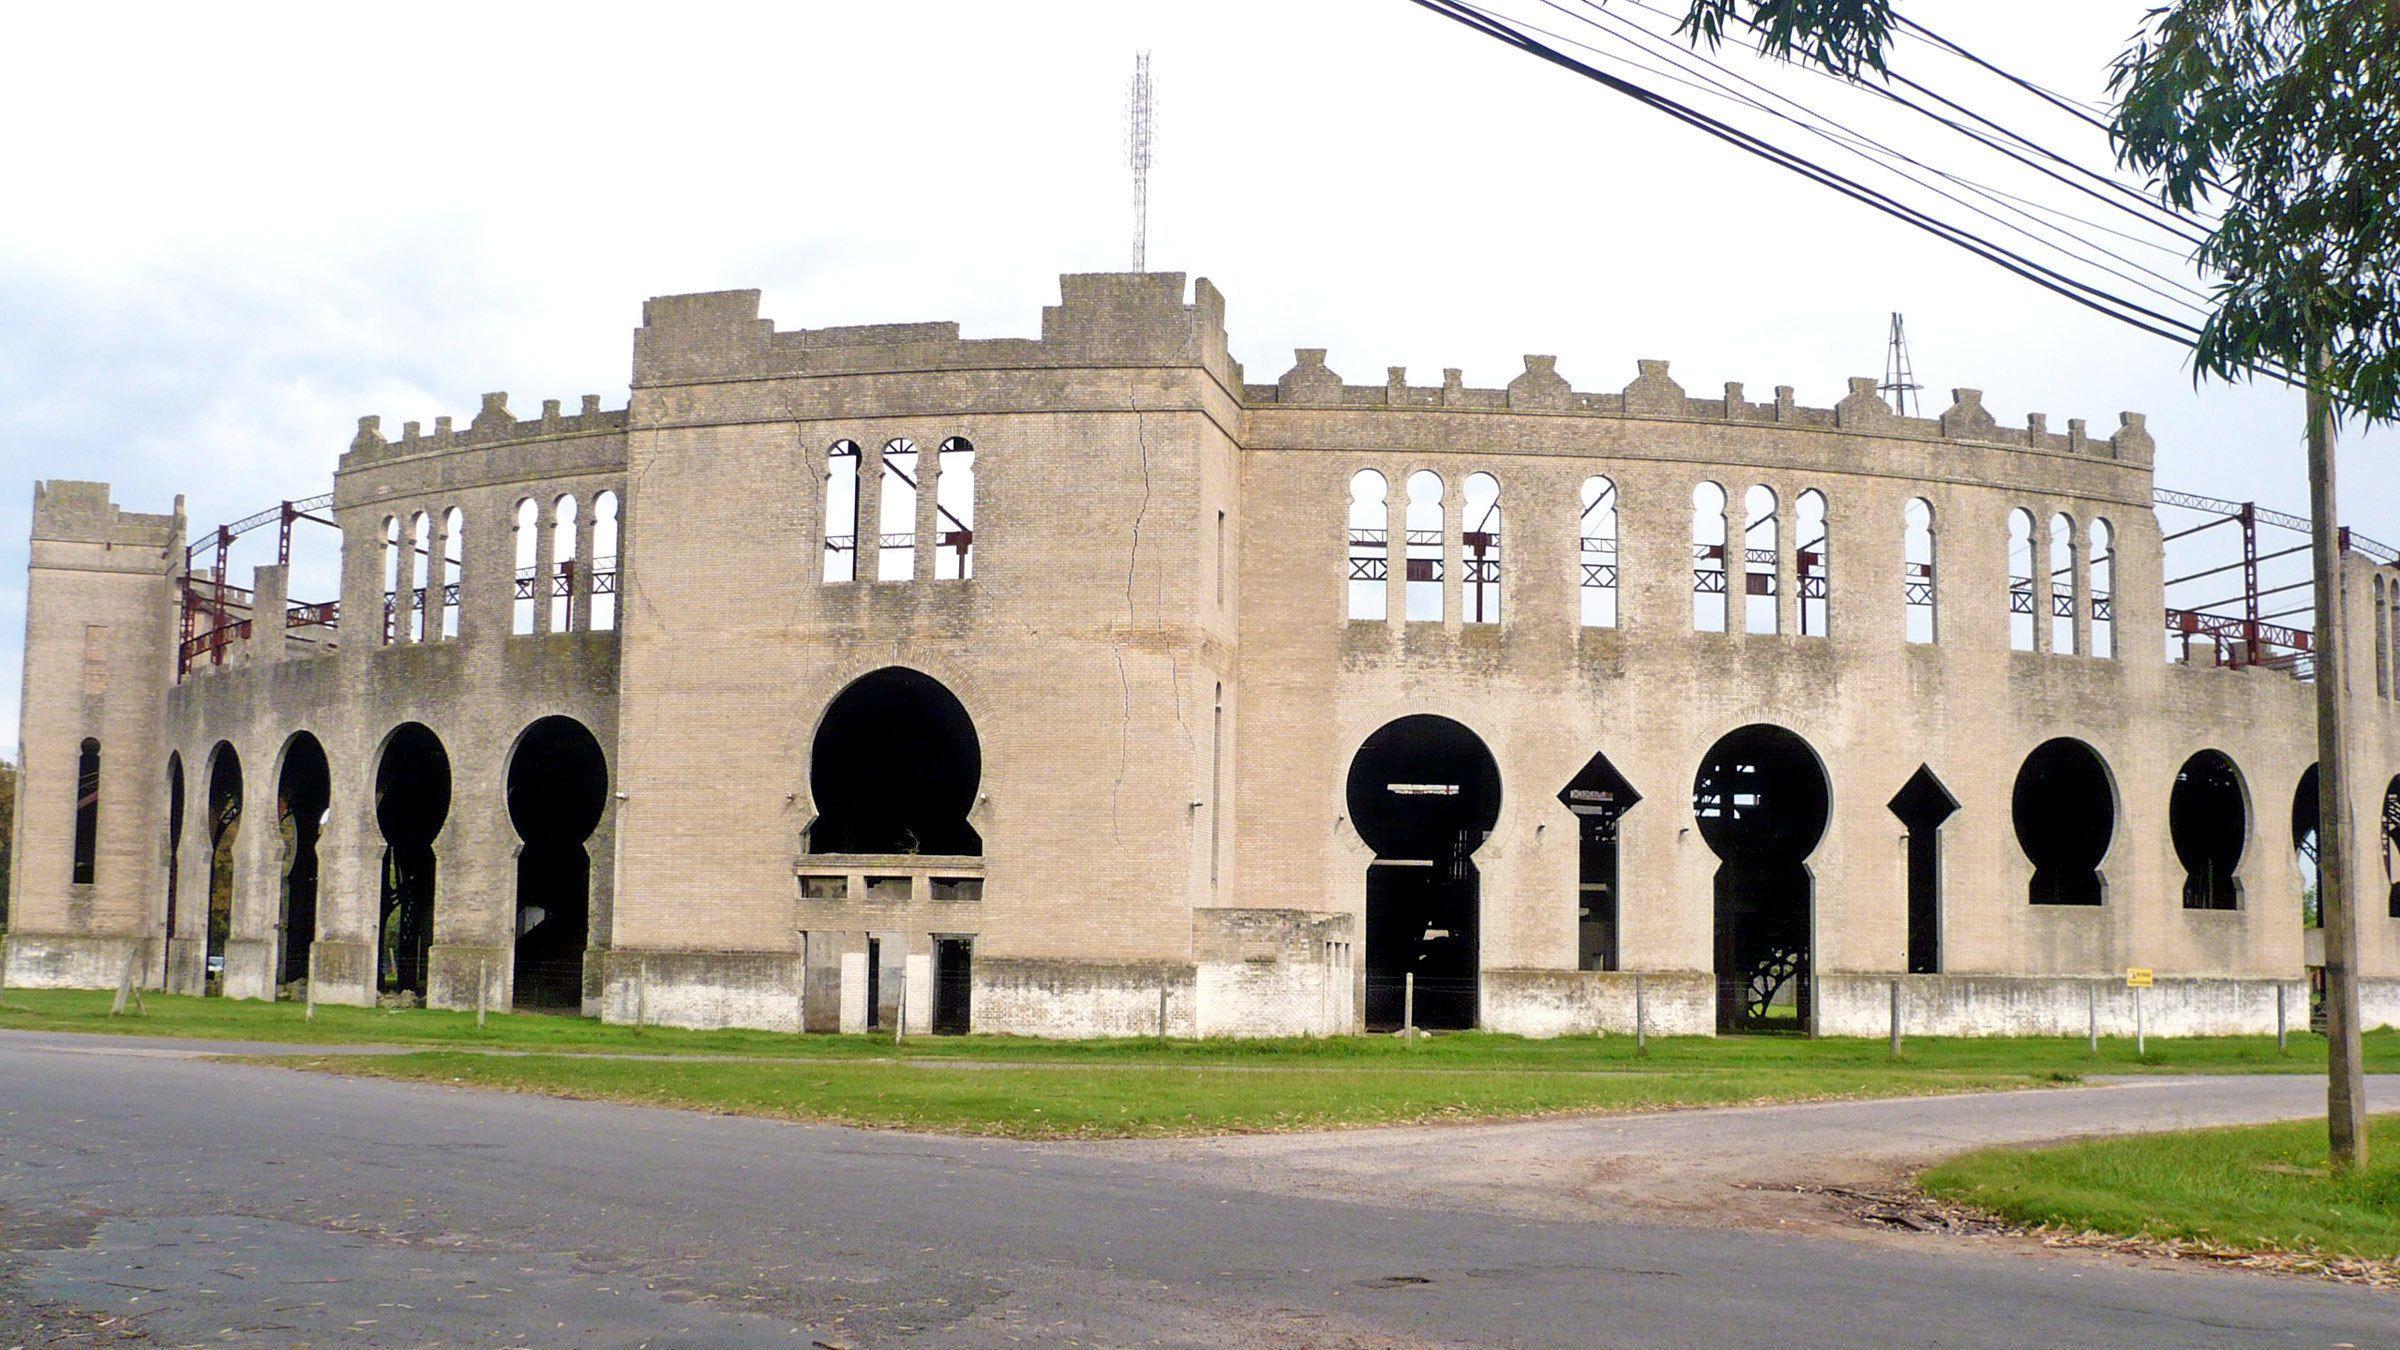 the outer walls of the Plaza de toros Real de San Carlos in Argentina